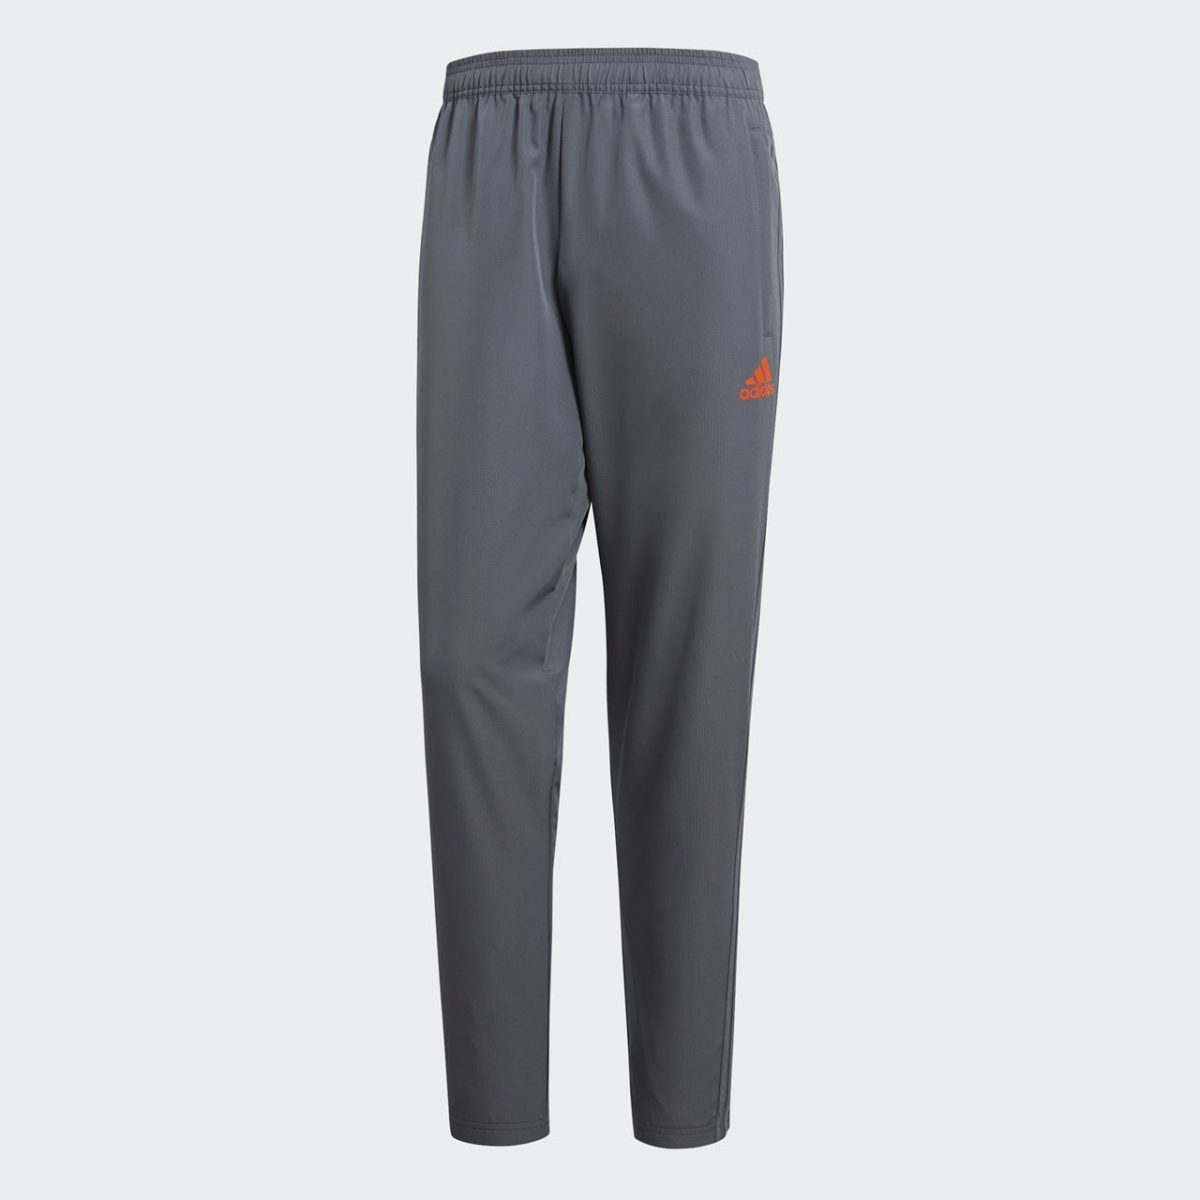 Adidas Condivo 18 Woven Pant Adult